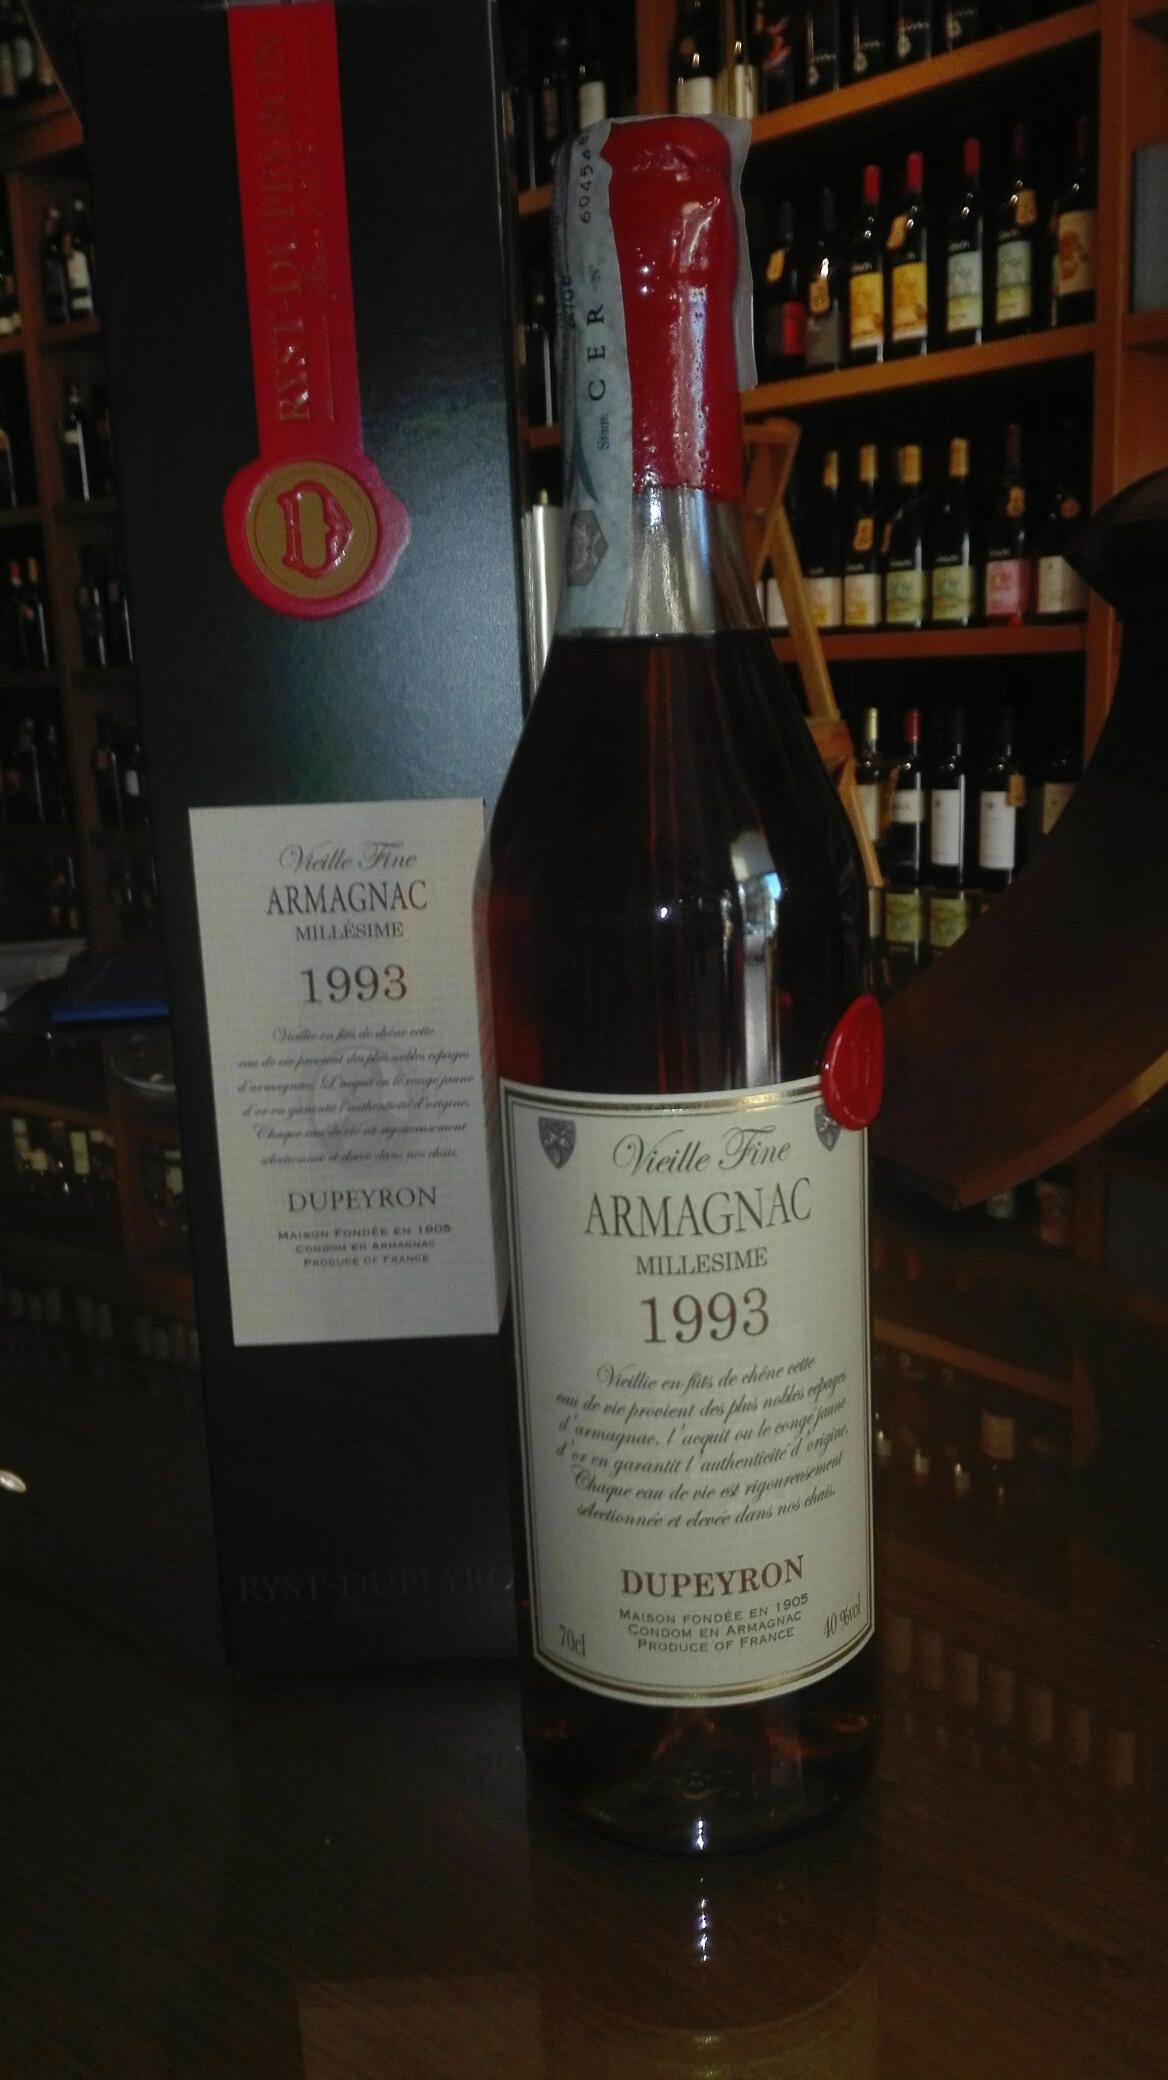 Armagnac Dupeyron 1993